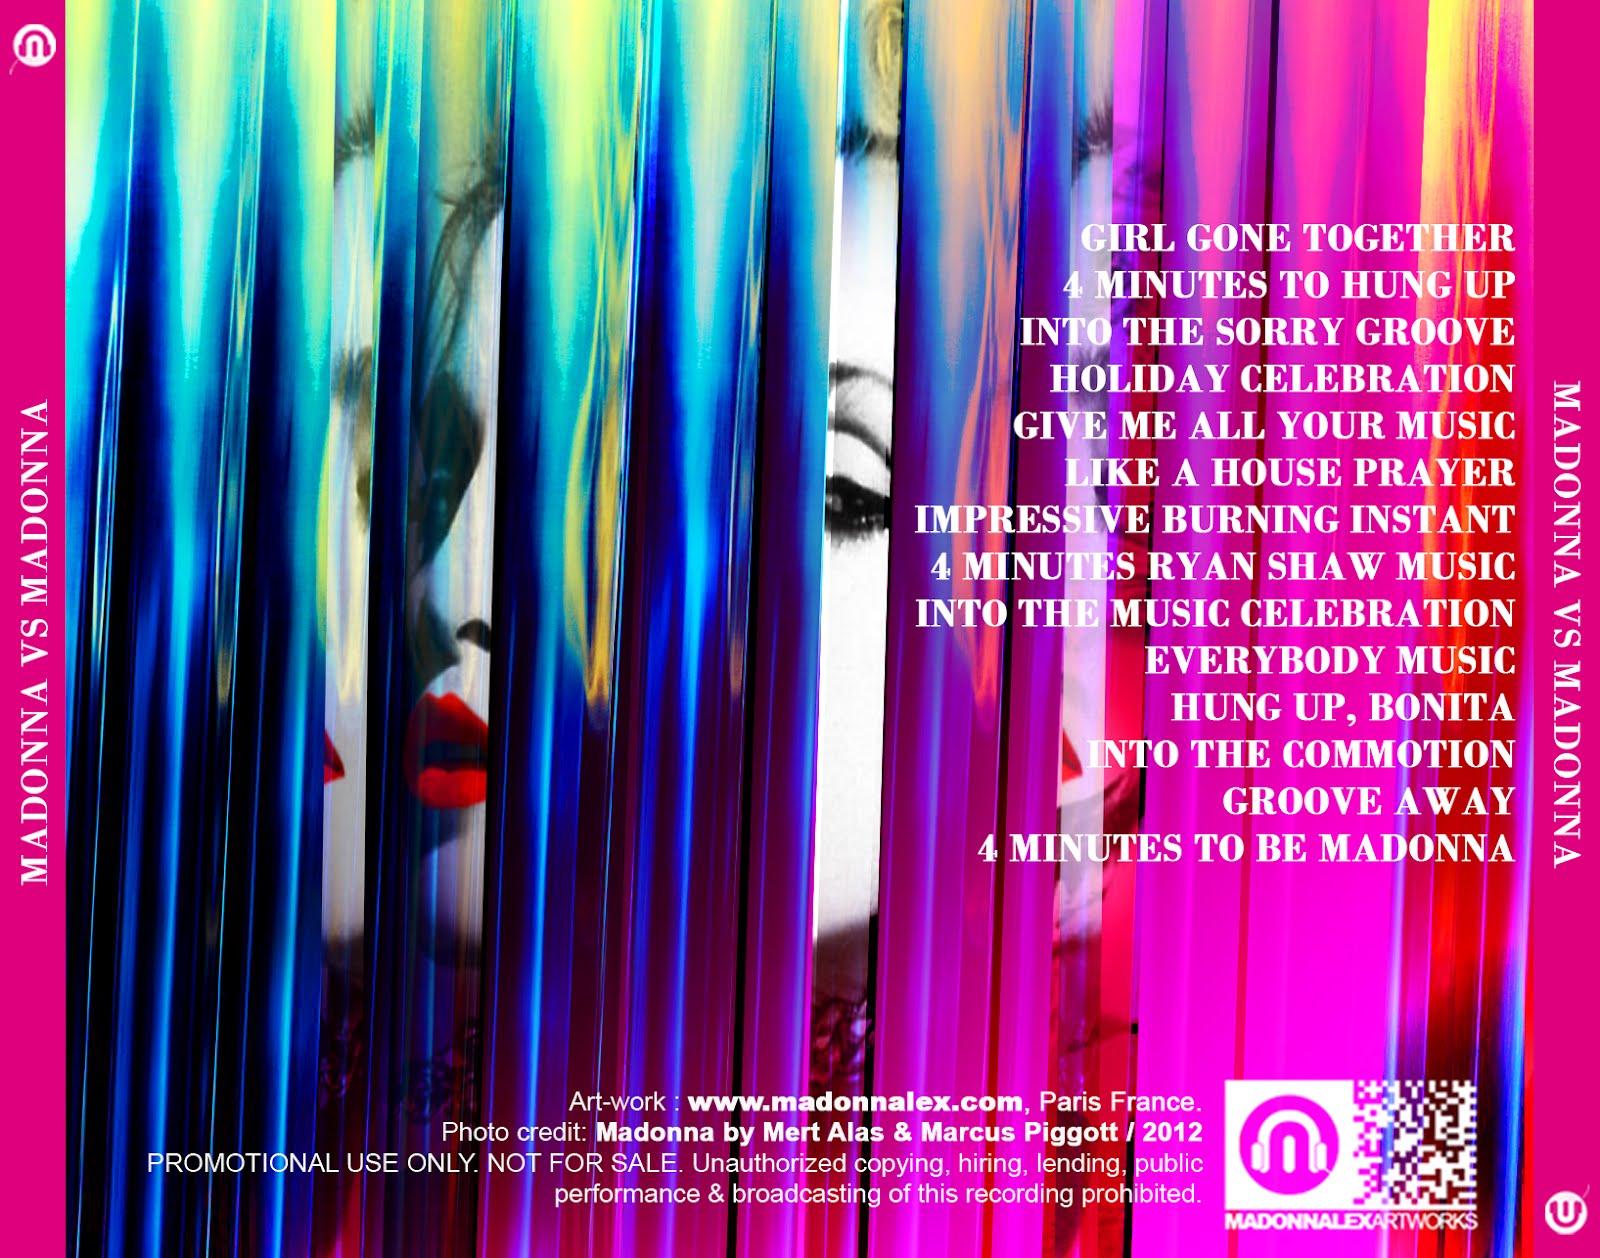 http://1.bp.blogspot.com/-ARodMw5vP3c/T2cGUji19WI/AAAAAAAAH38/6yiosojkJ_Q/s1600/Madonna%2BVS%2BMadonna%2B-%2Bbackcover.jpg